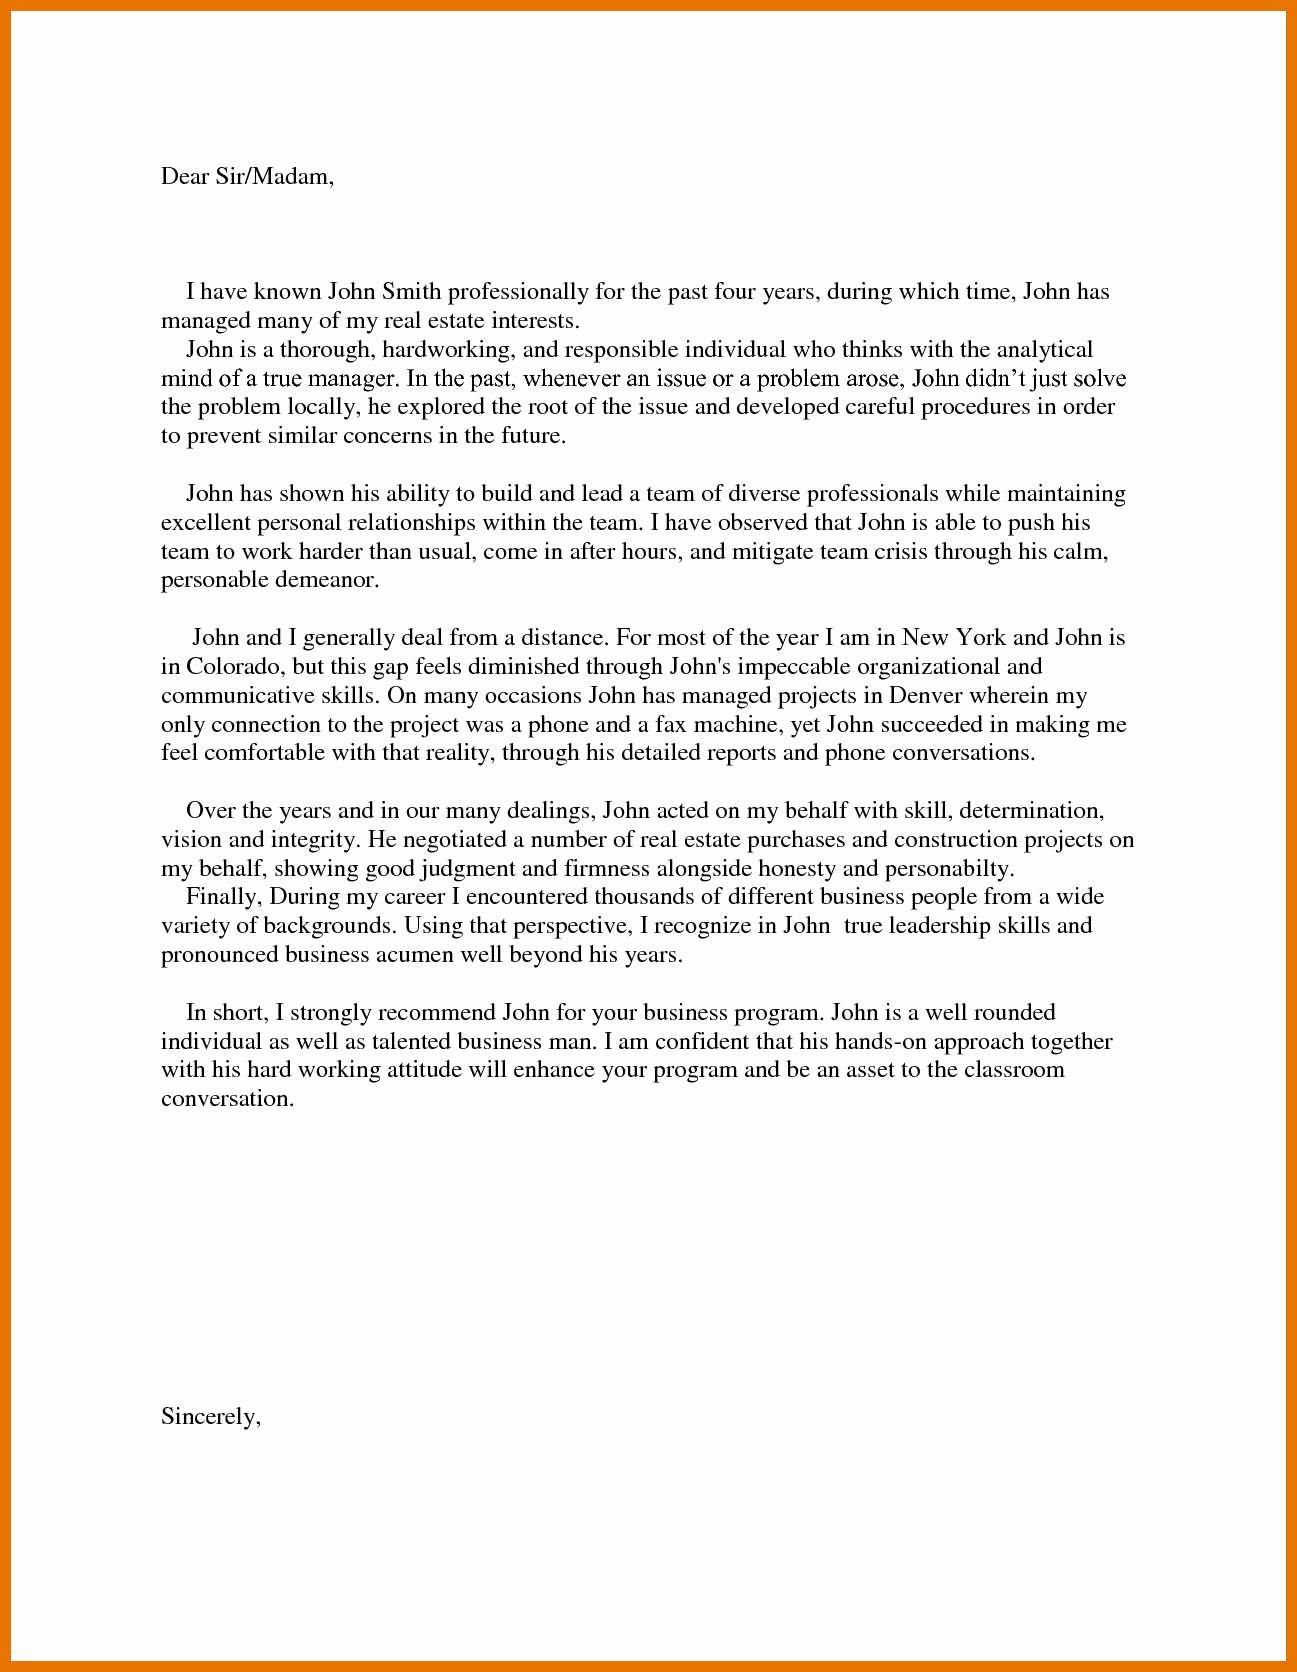 Stanford Letter Of Recommendation Fresh 5 6 Mba Letter Of Re Mendation Sample